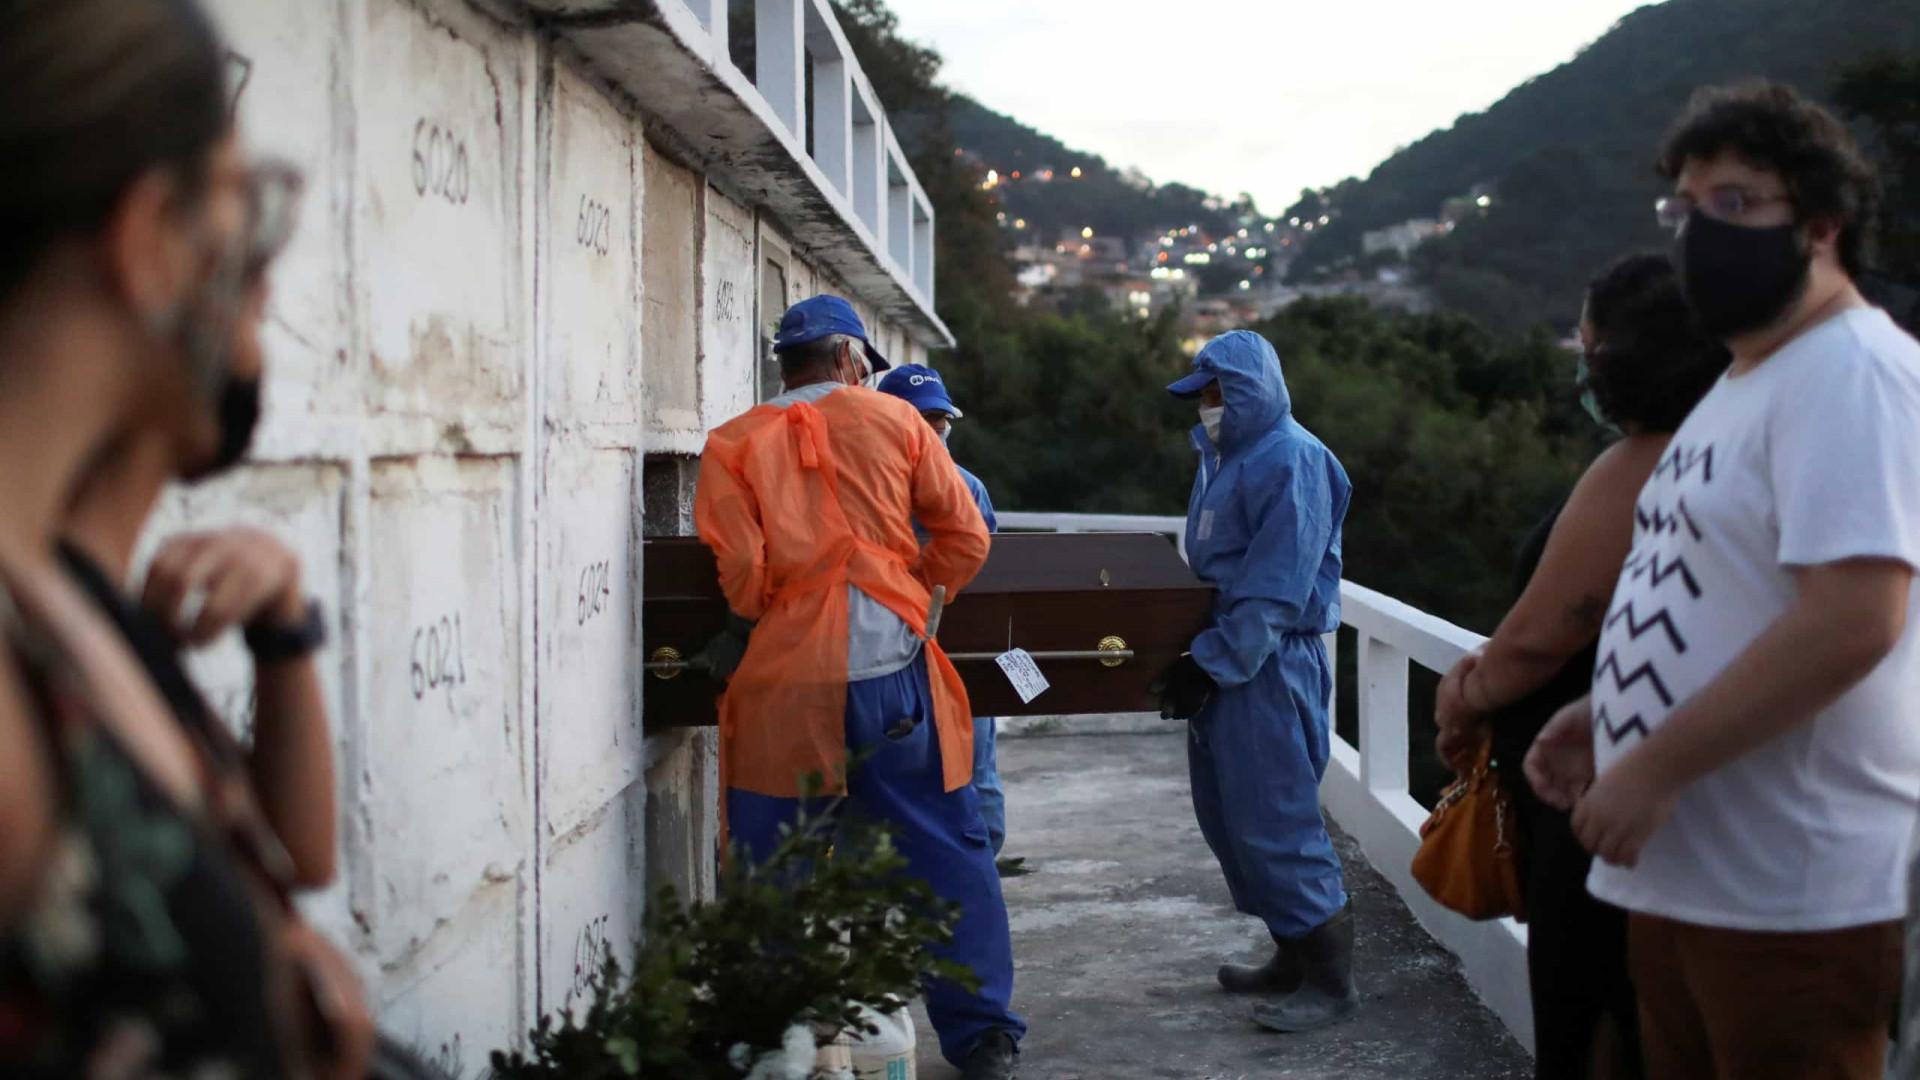 Brasil registra 2.787 mortes por covid-19 em 24h; total chega a 303.462